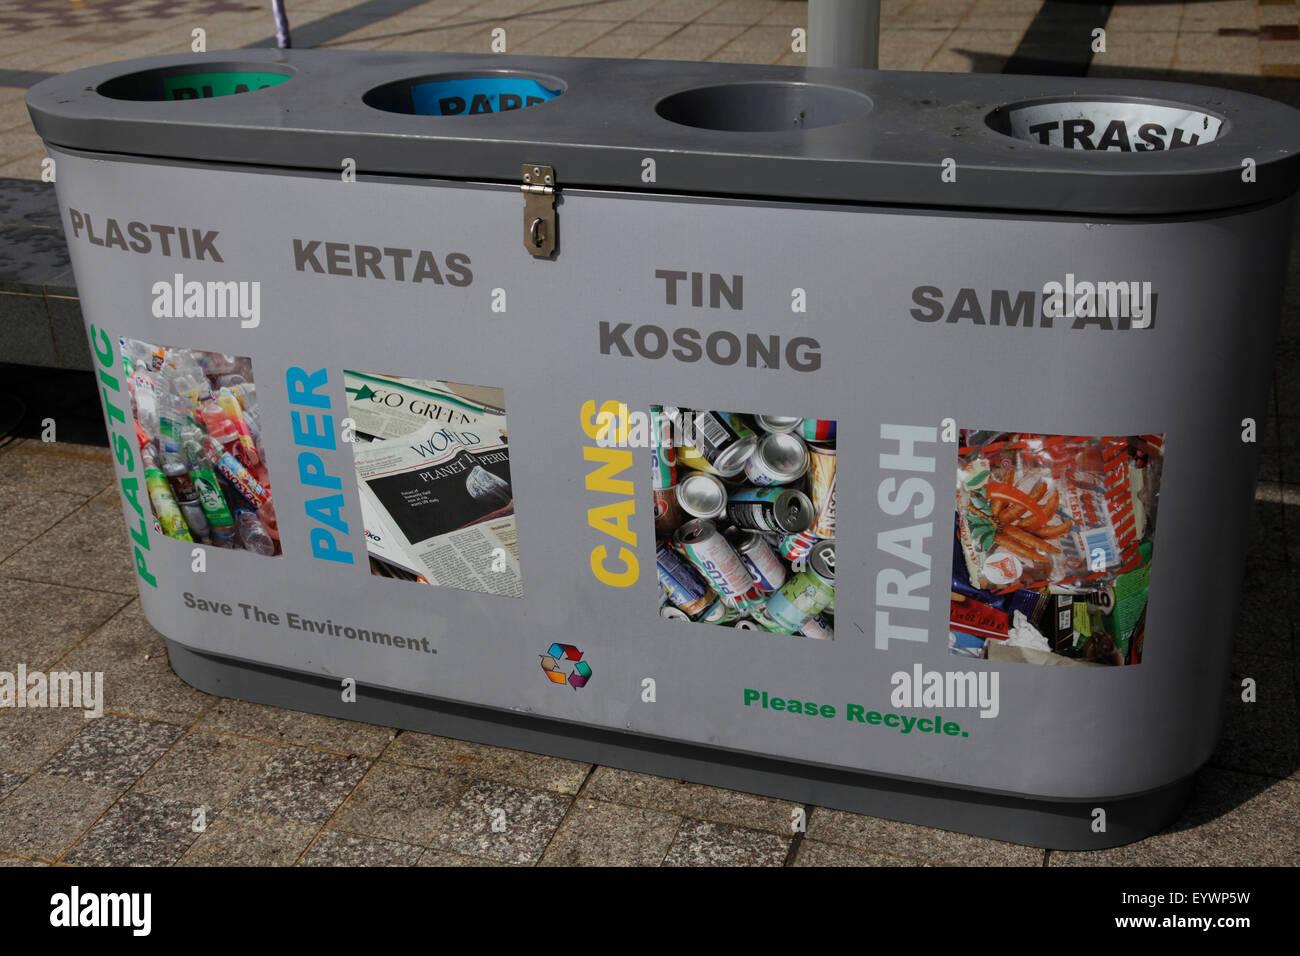 Impianti di riciclaggio in Bandar Seri Begawan, Brunei, Asia sud-orientale, Asia Immagini Stock